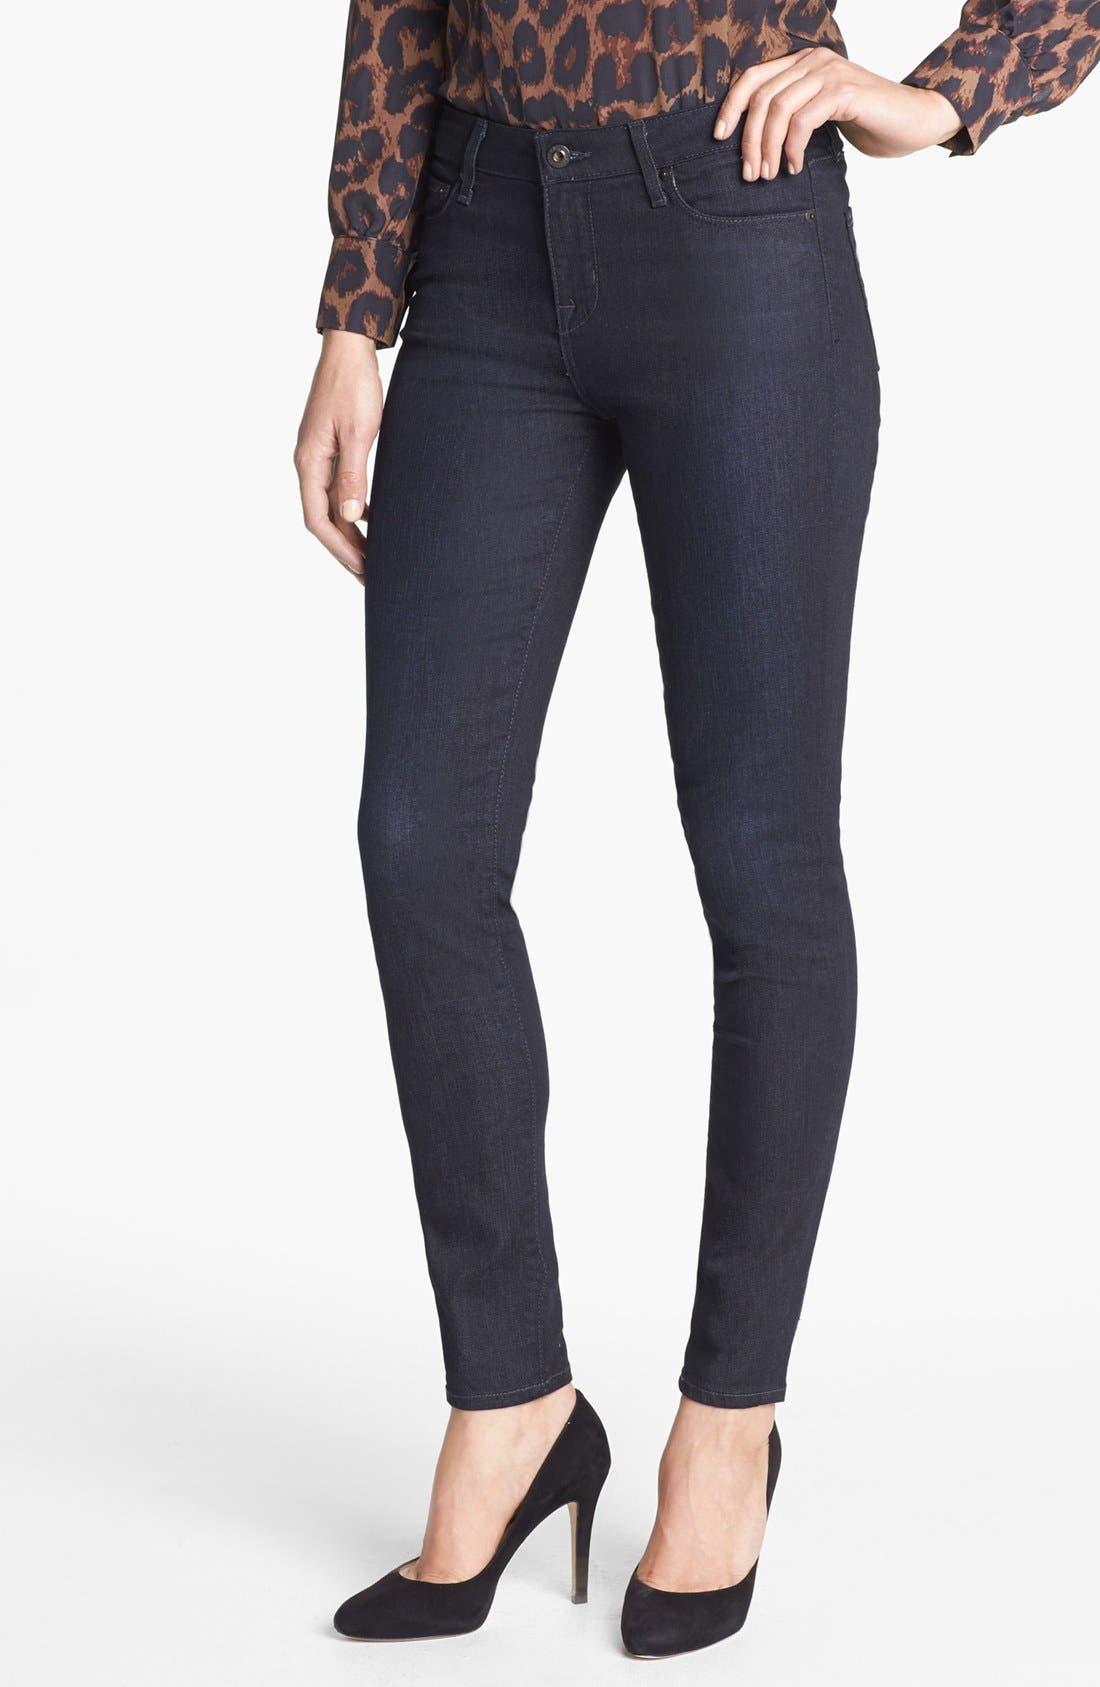 Main Image - Big Star 'Alex' Stretch Skinny Jeans (Avignon) (Petite)